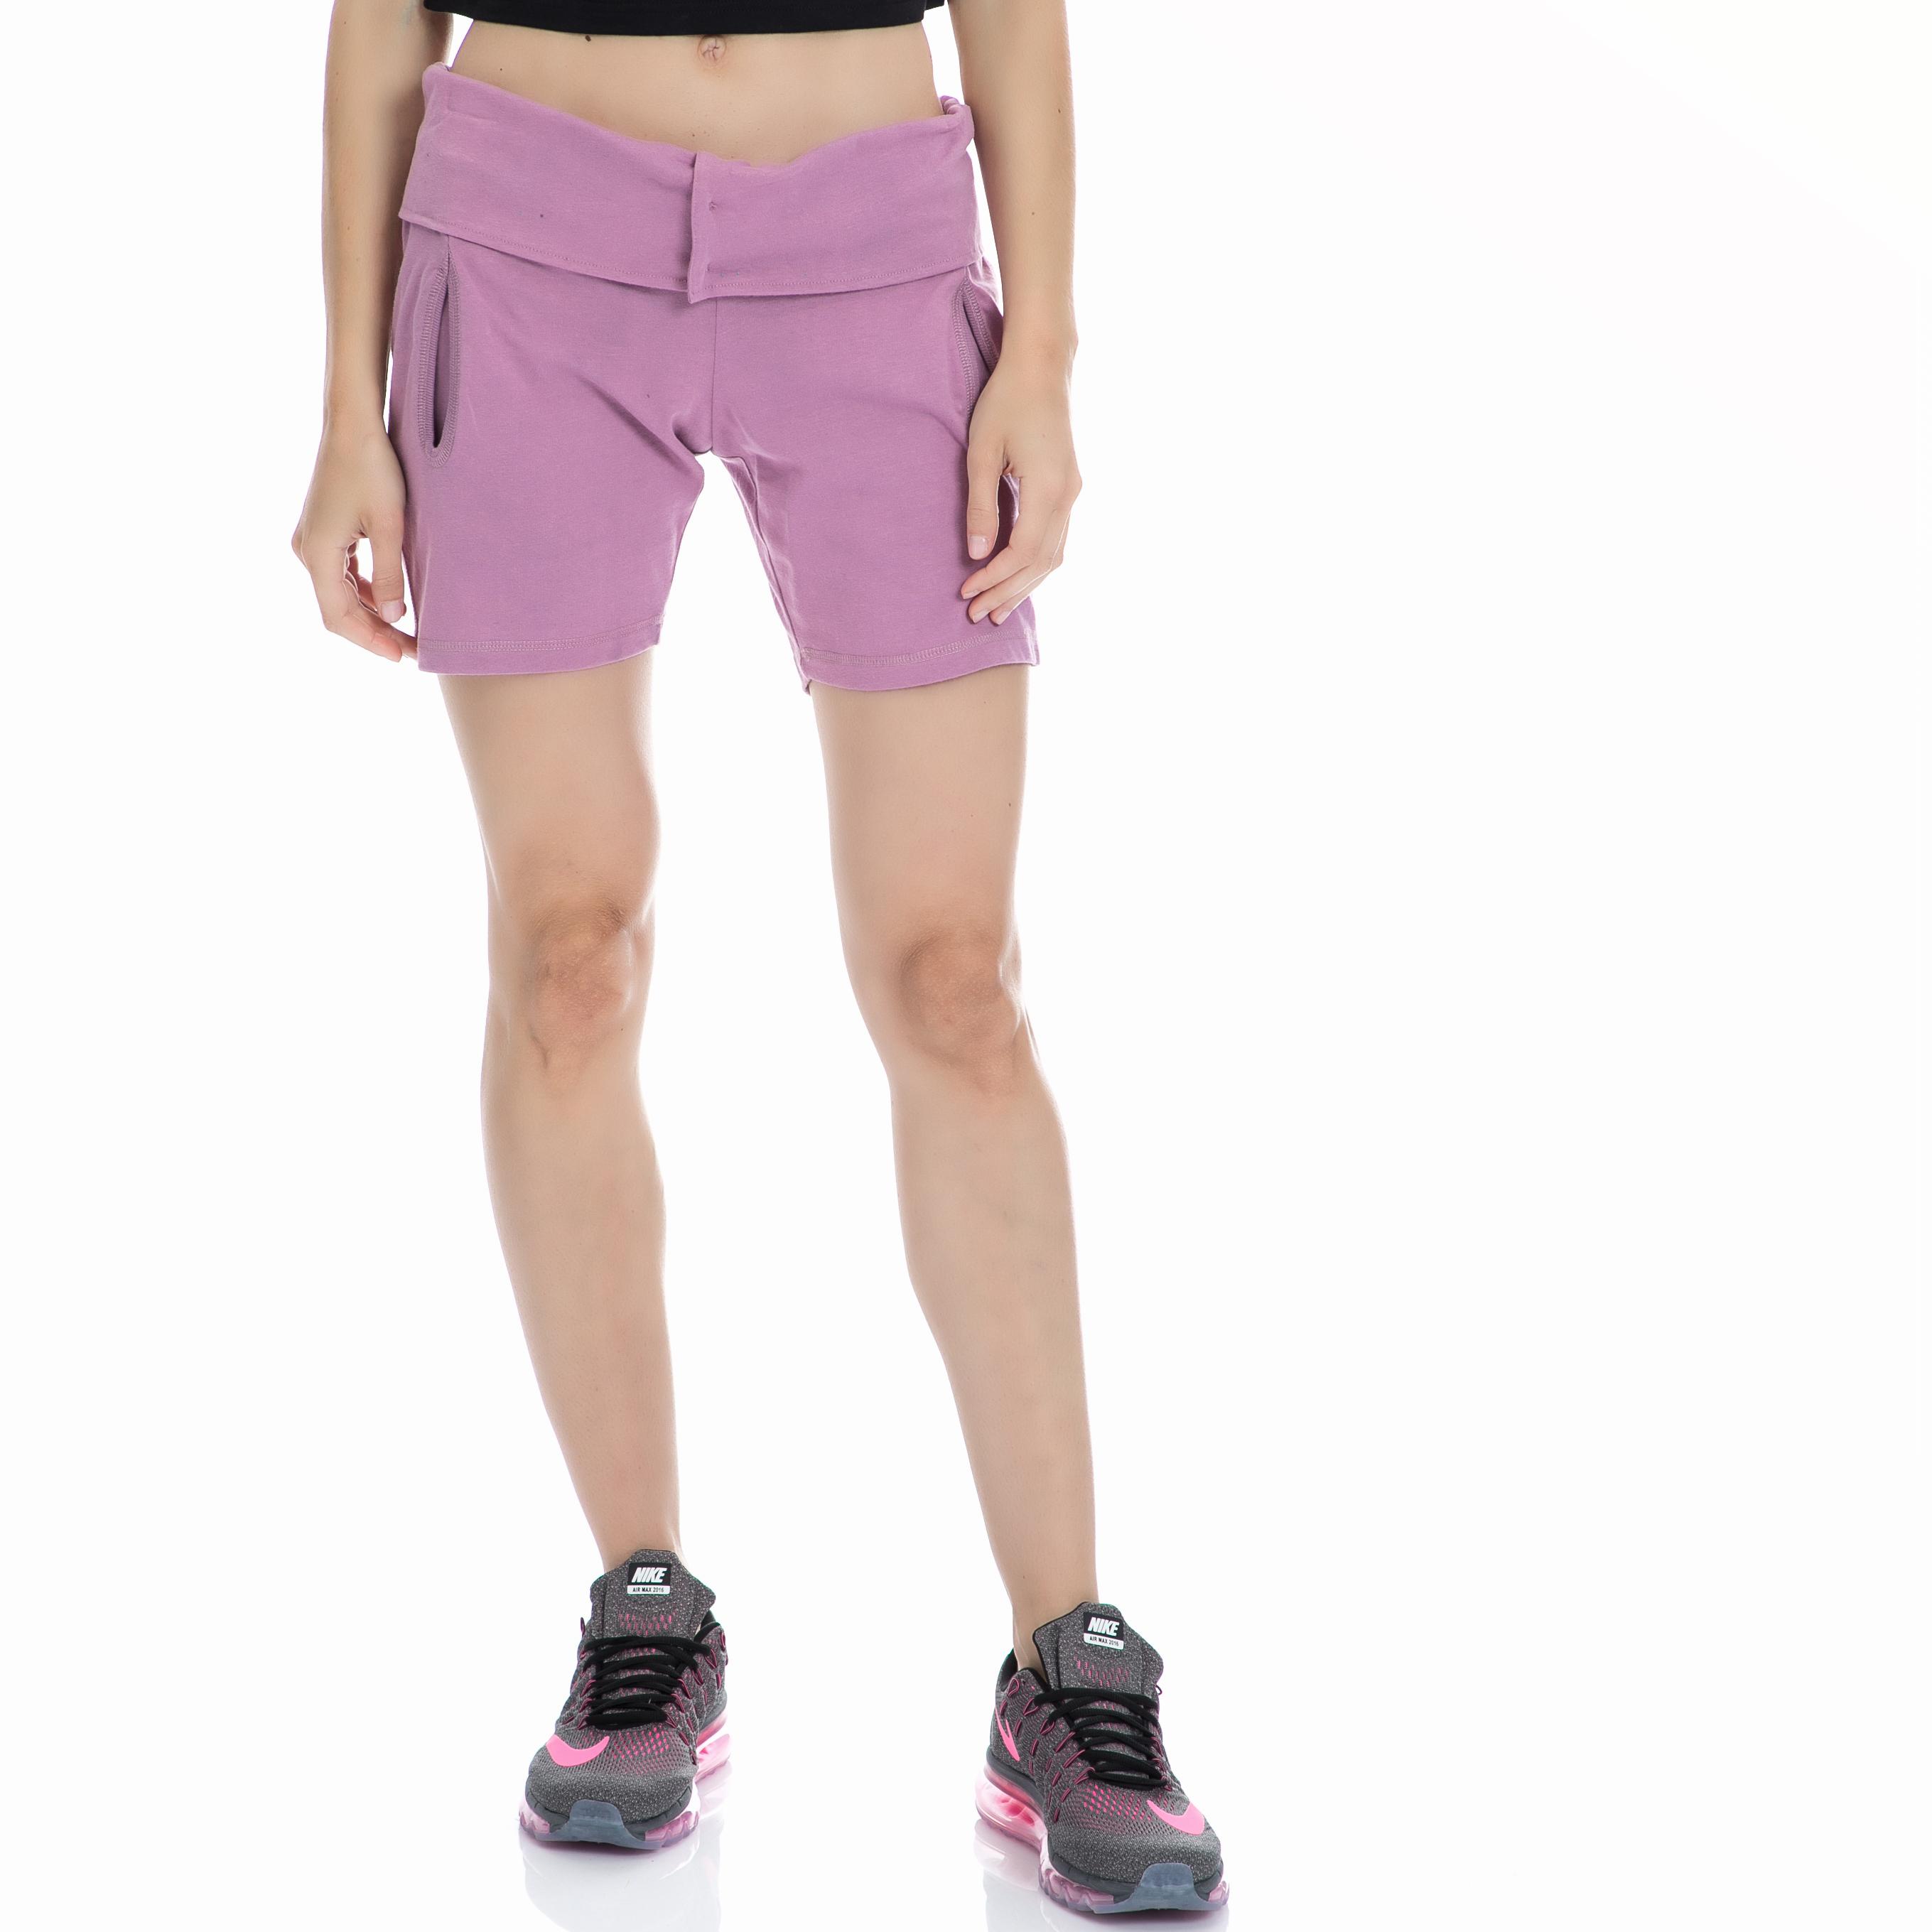 BODYTALK - Γυναικείο σορτς BODYTALK μοβ γυναικεία ρούχα σορτς βερμούδες αθλητικά